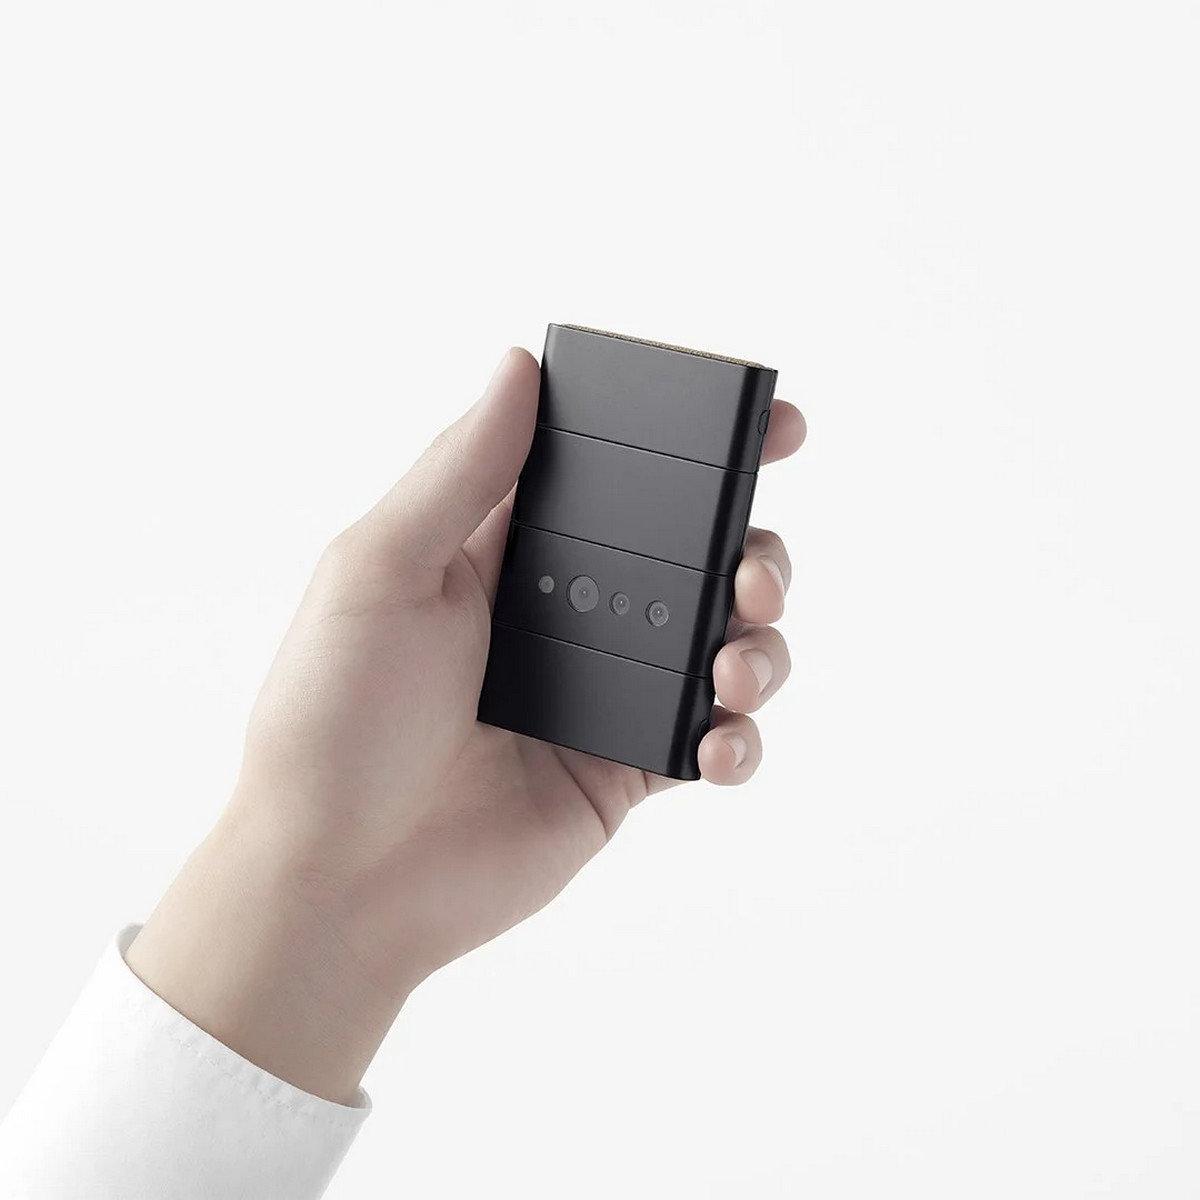 Oppo представила уникальный слайдфон